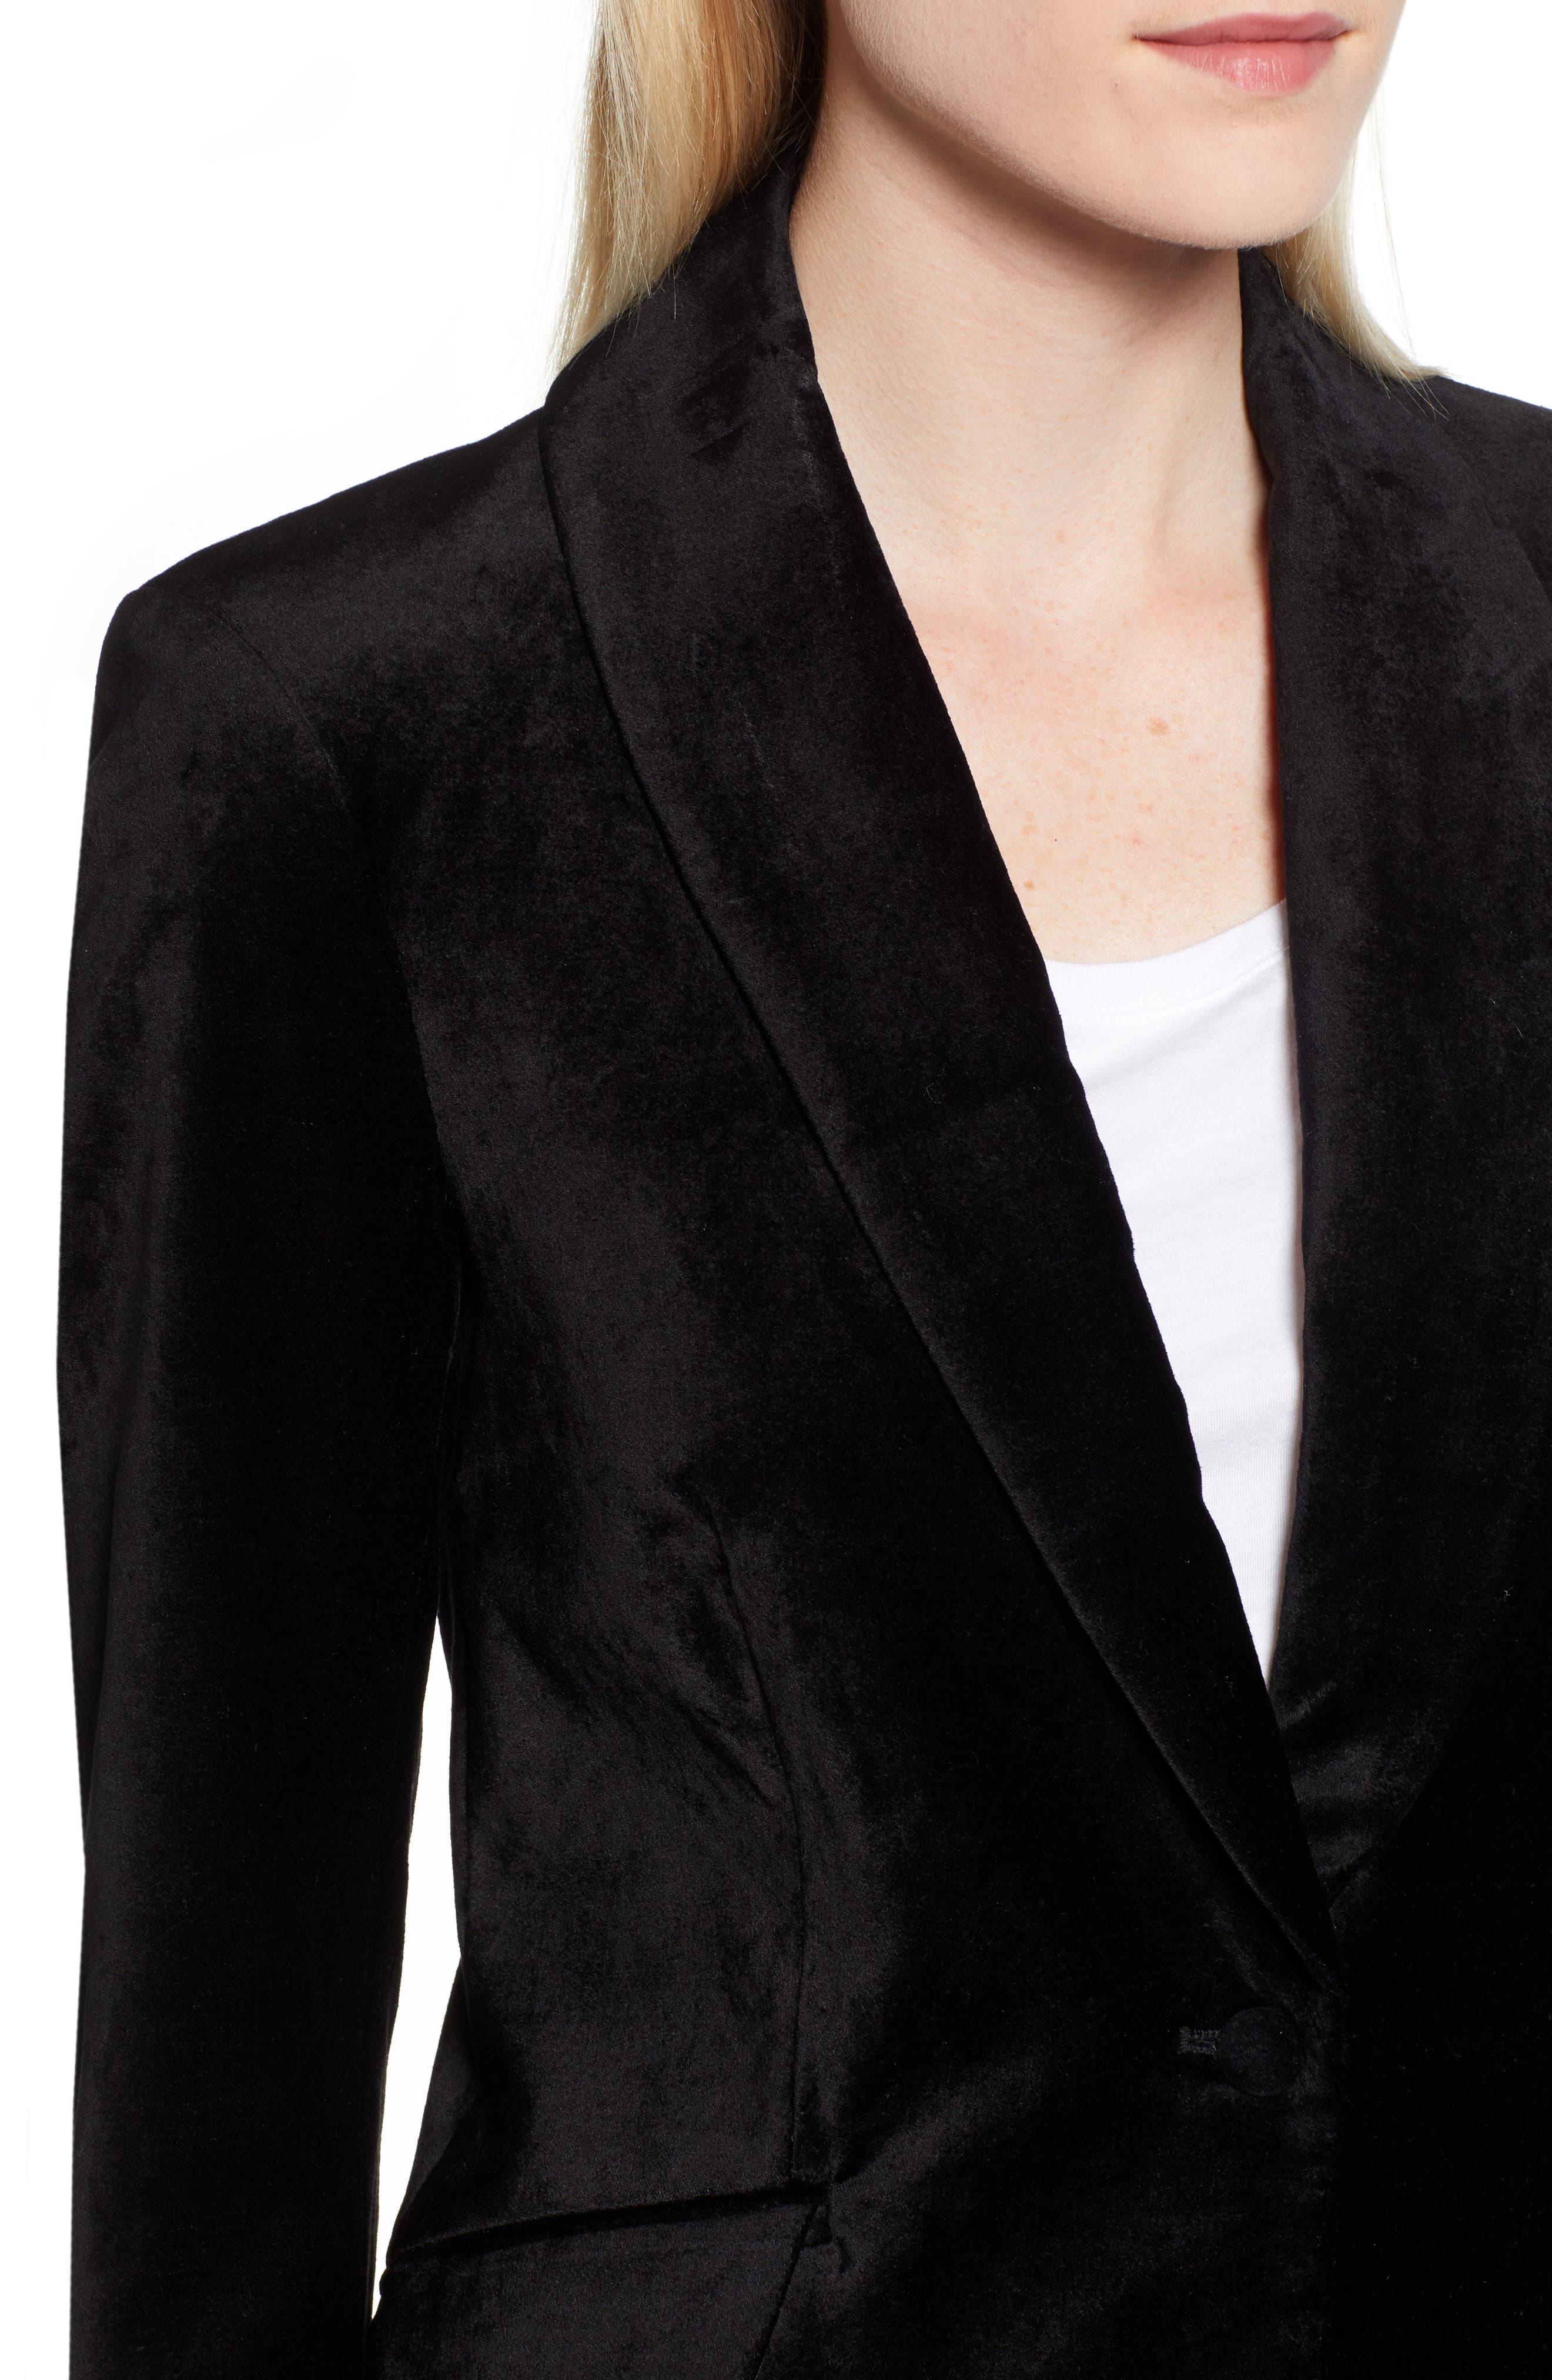 JEN7 BY 7 FOR ALL MANKIND,                             Stretch Cotton Velvet Blazer,                             Alternate thumbnail 4, color,                             BLACK